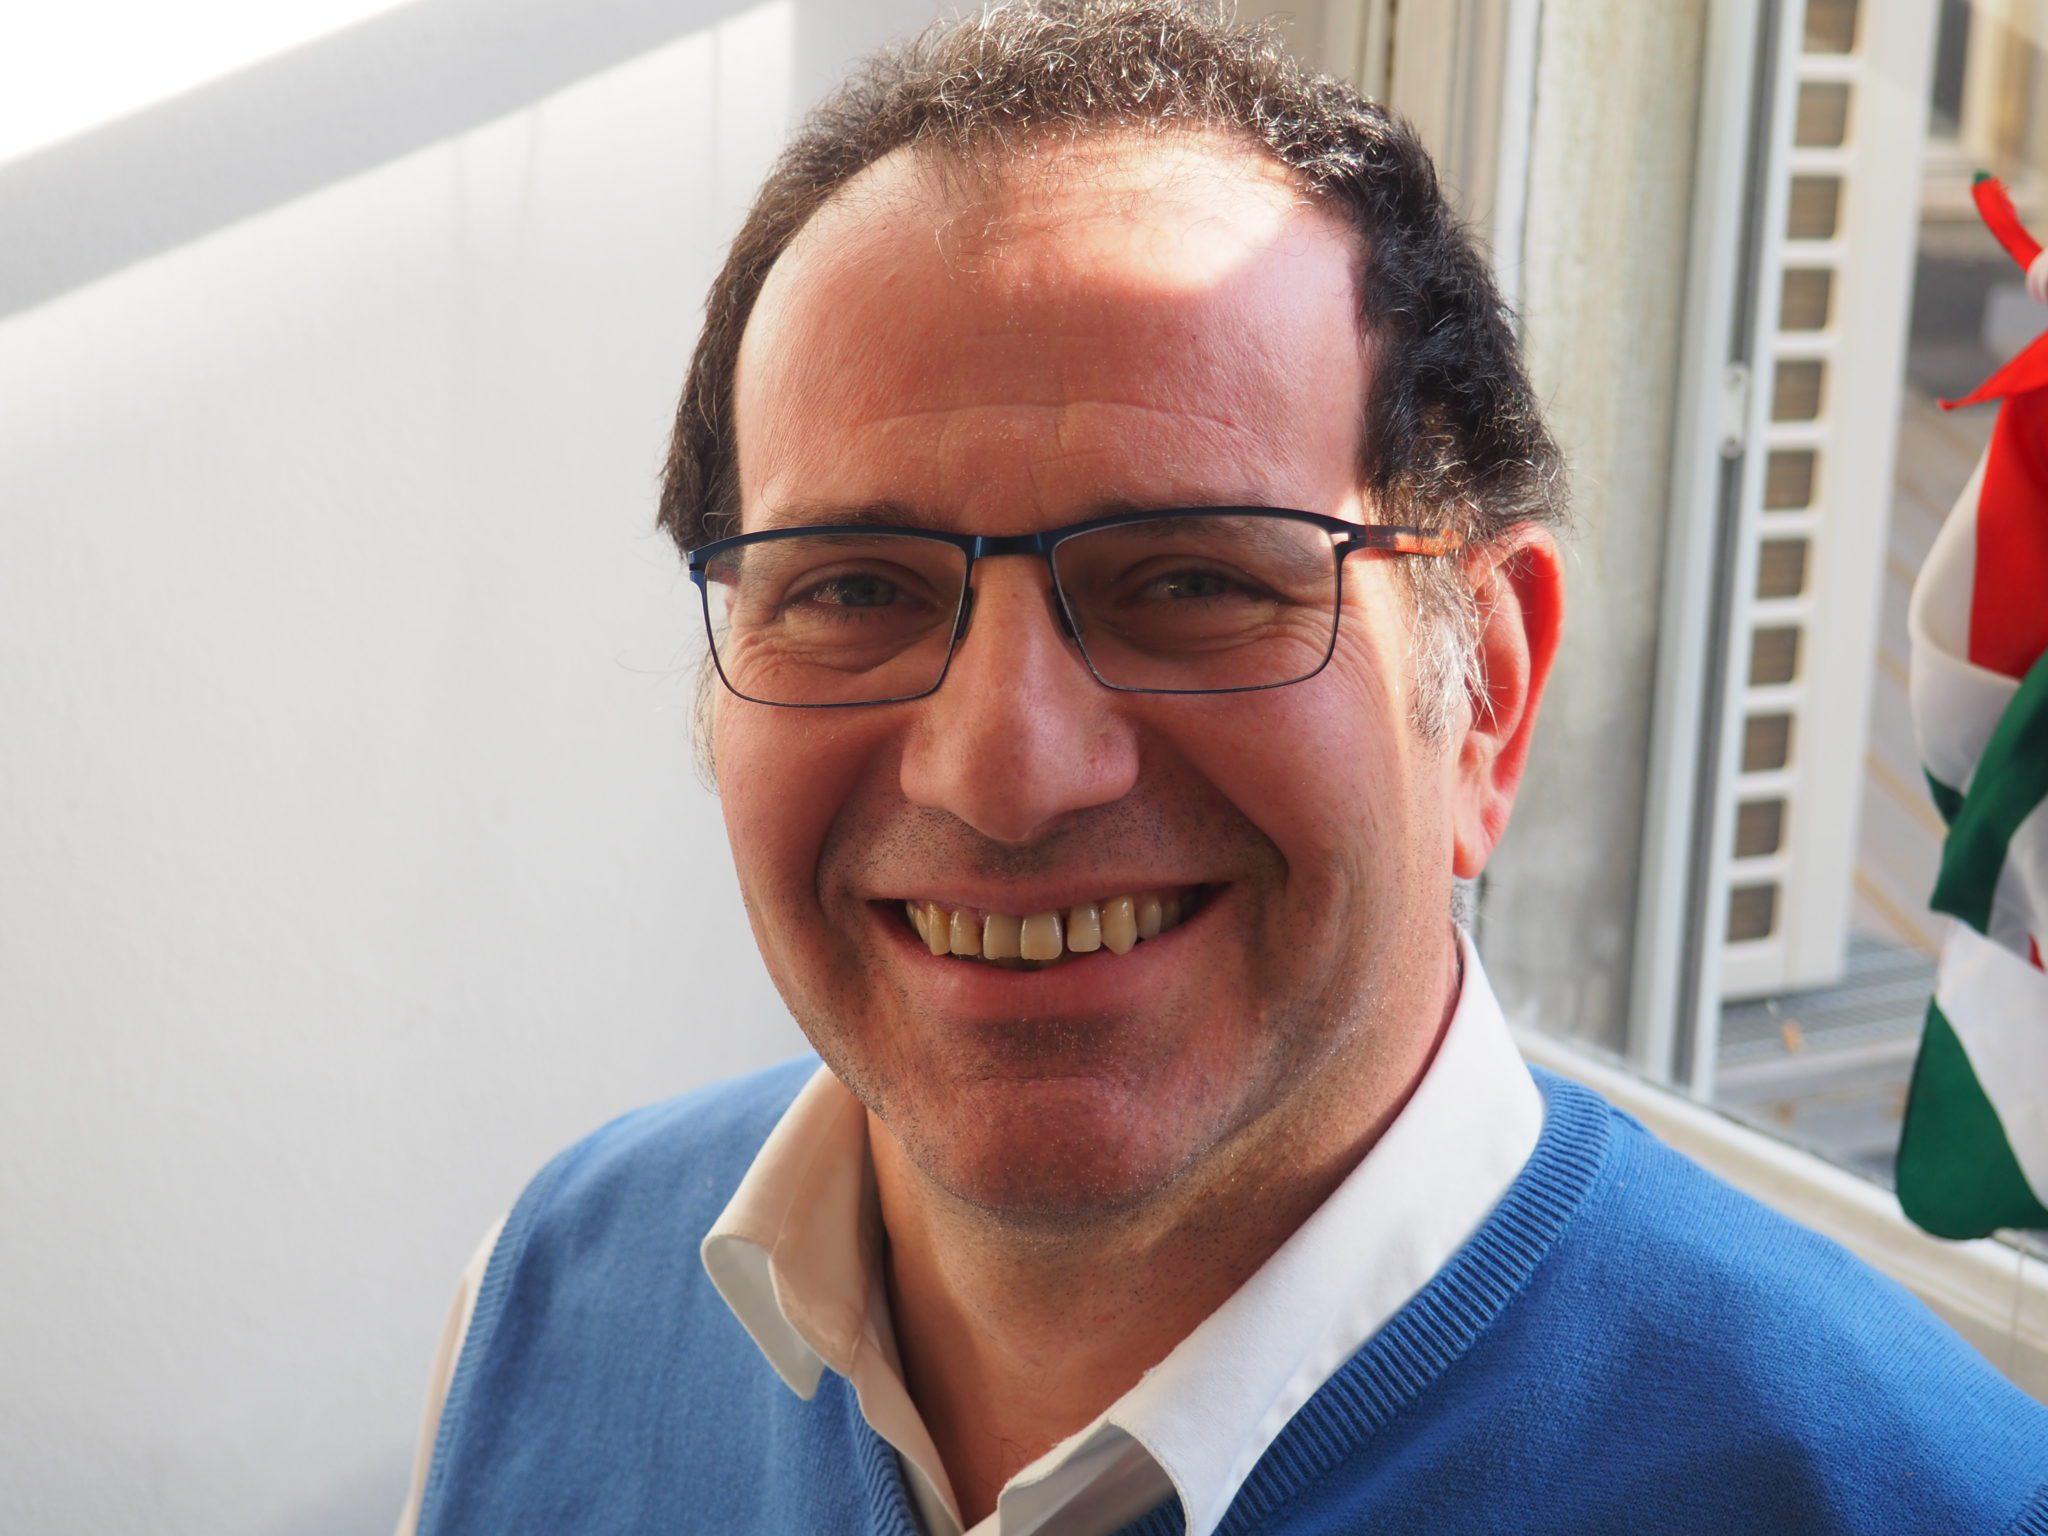 Gianni Baratta